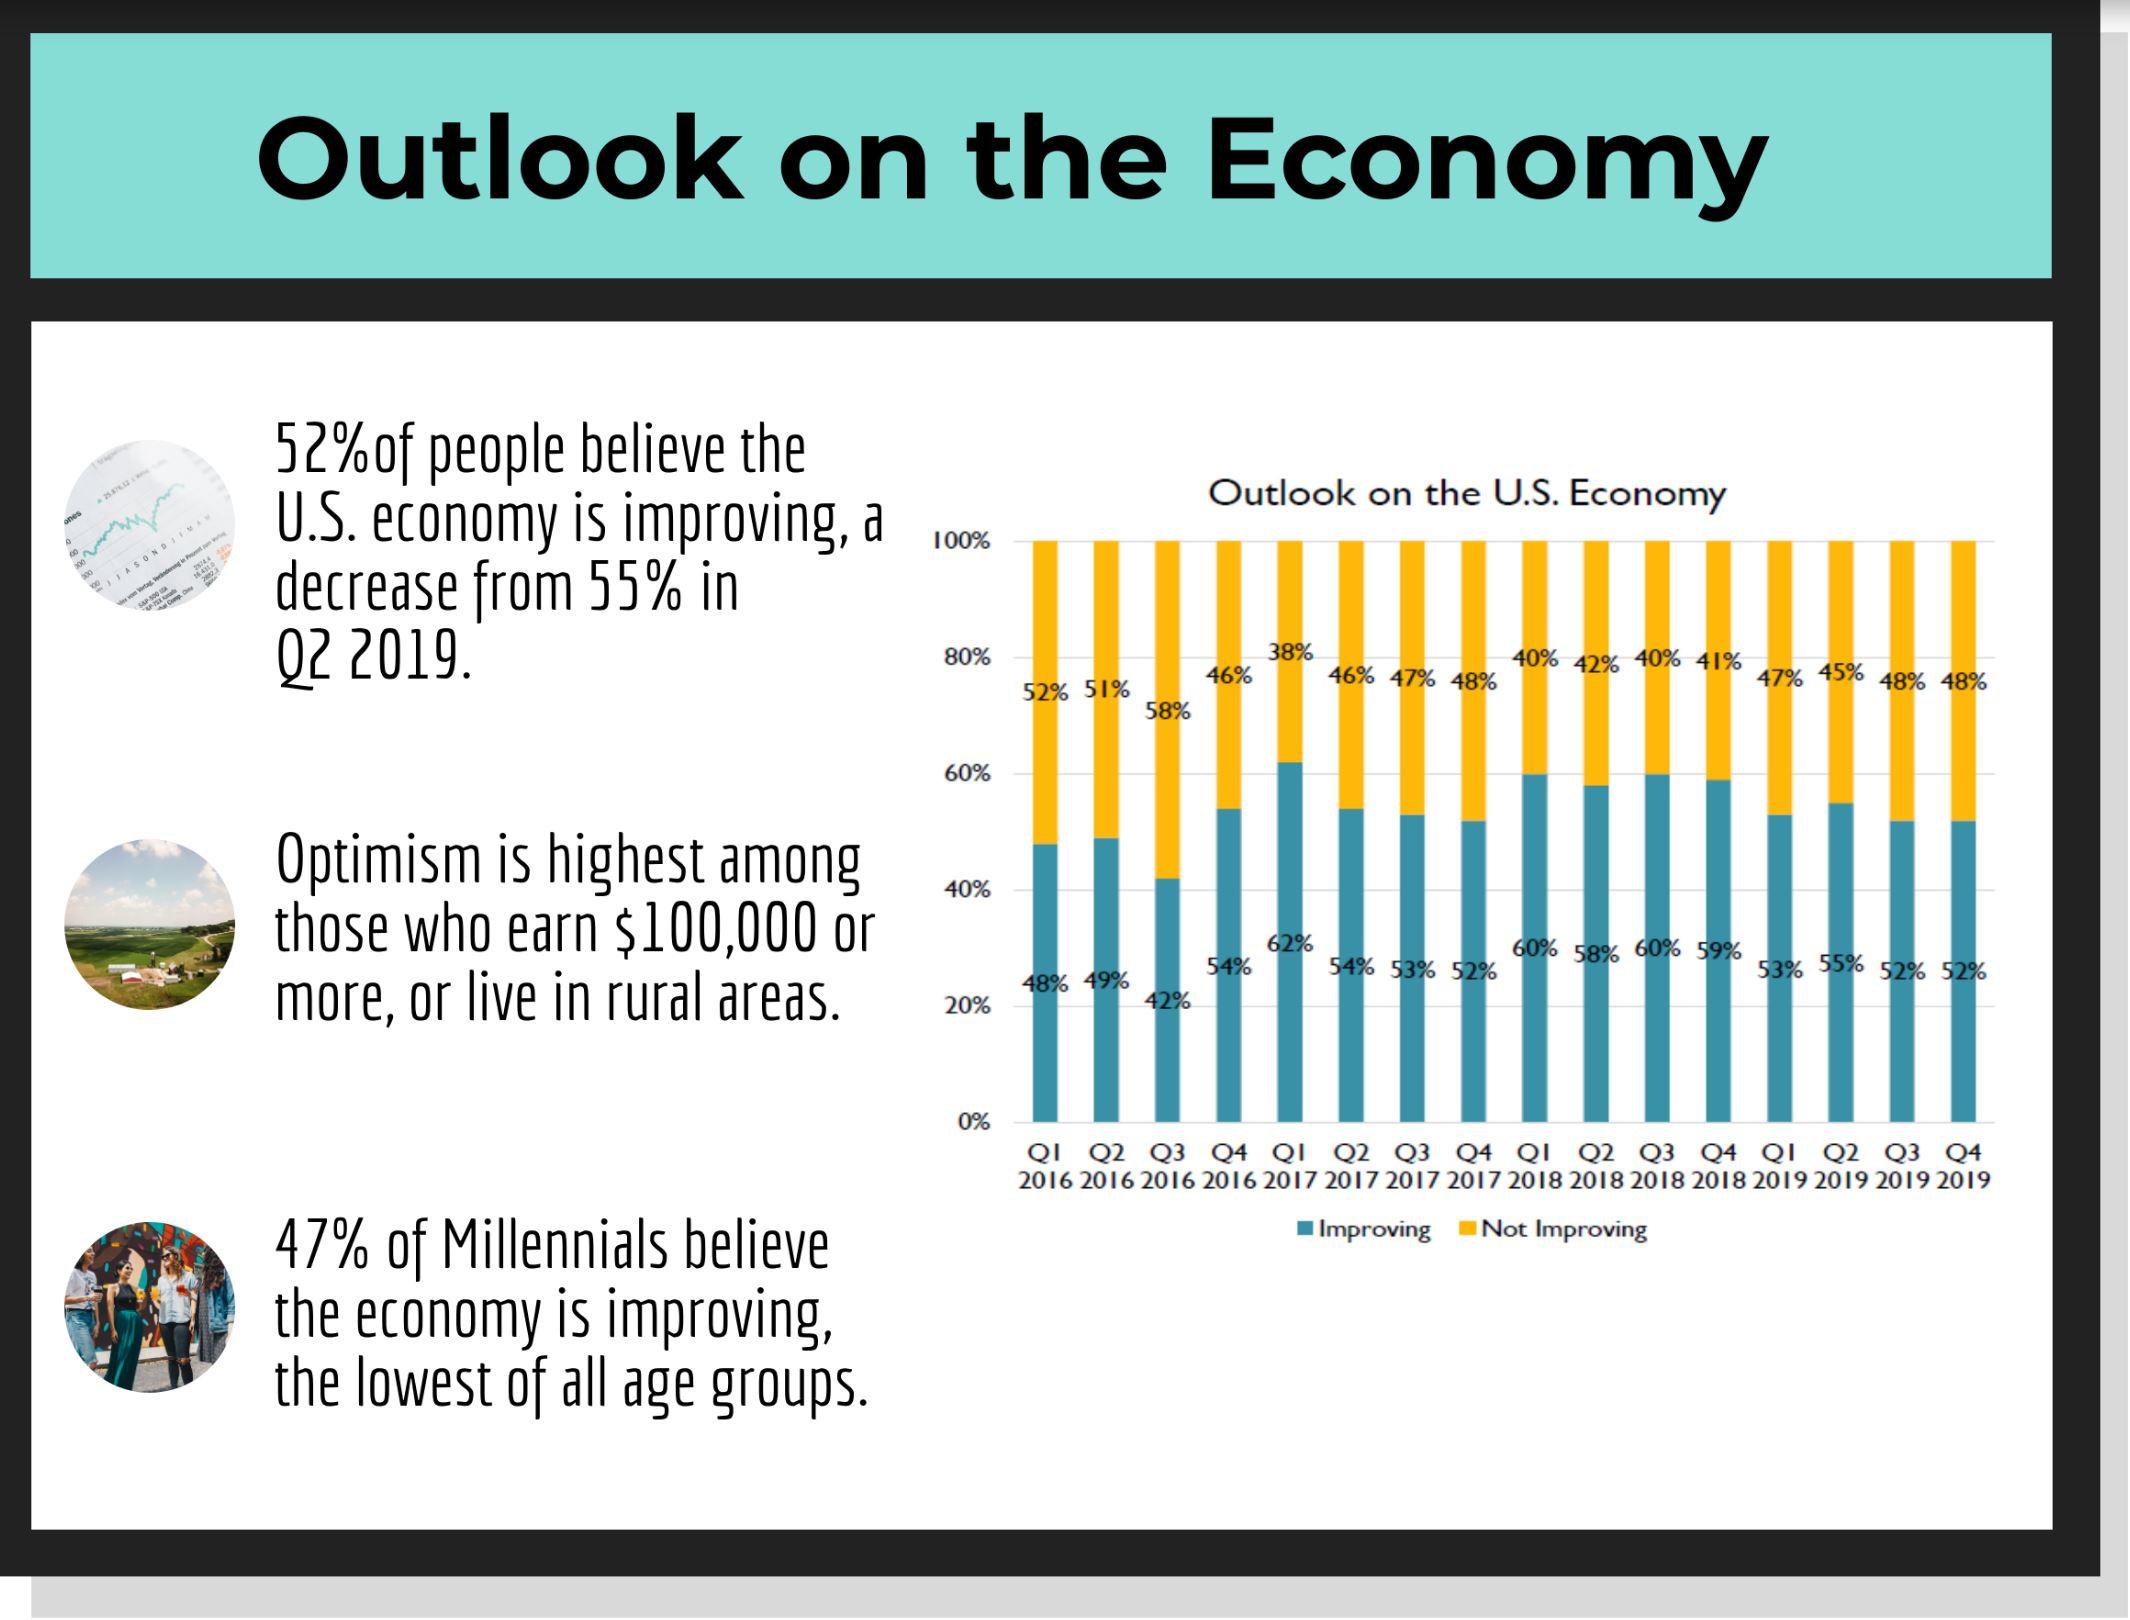 Realtor Magazine Jan 2020 01 09 Home Survey January 2020 Outlook on the economy Hoey Team eXp Realty